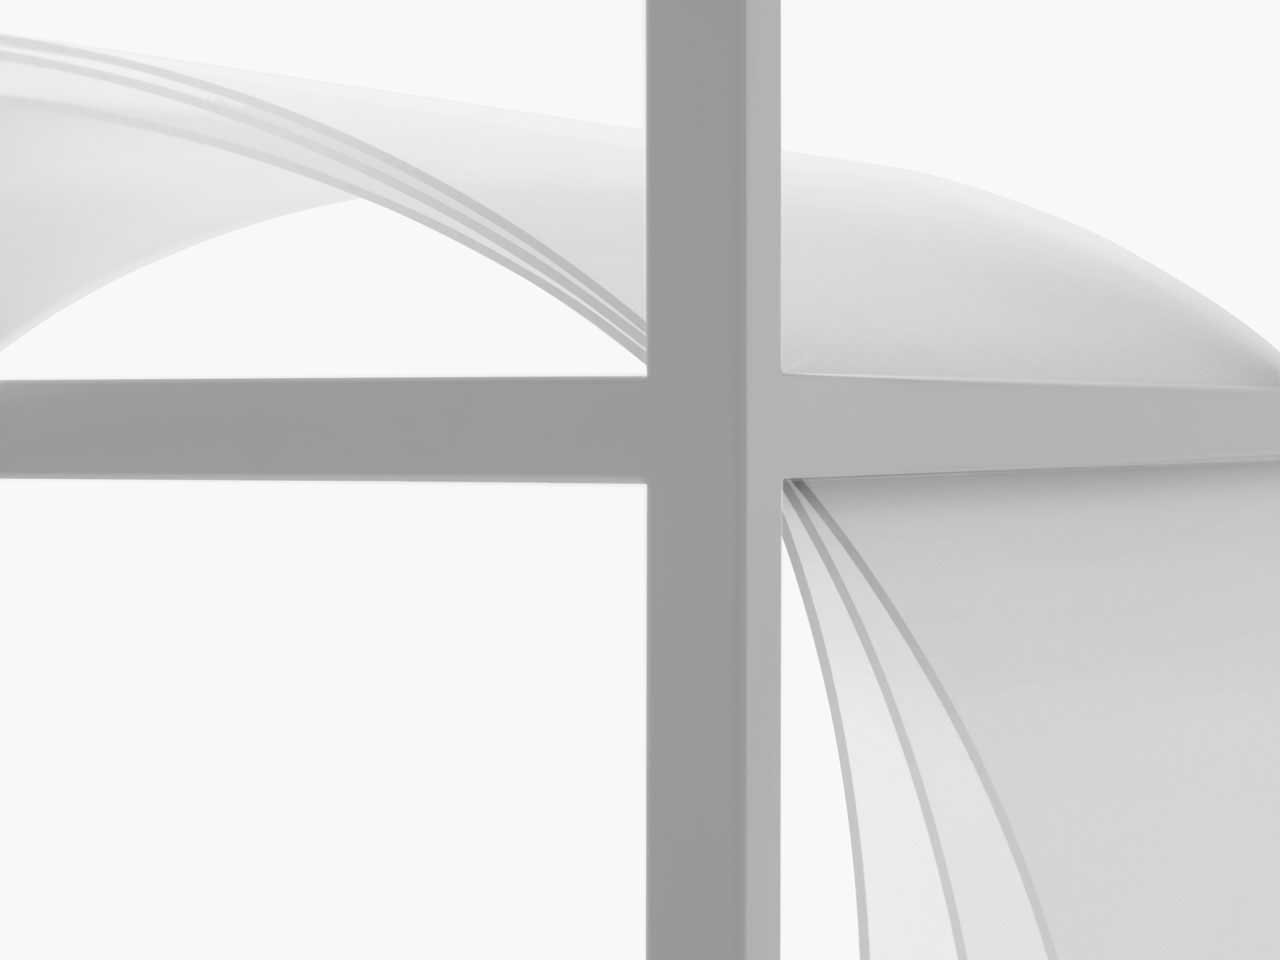 iGNANT_Design_Nendo_Bouncy_Layers_7